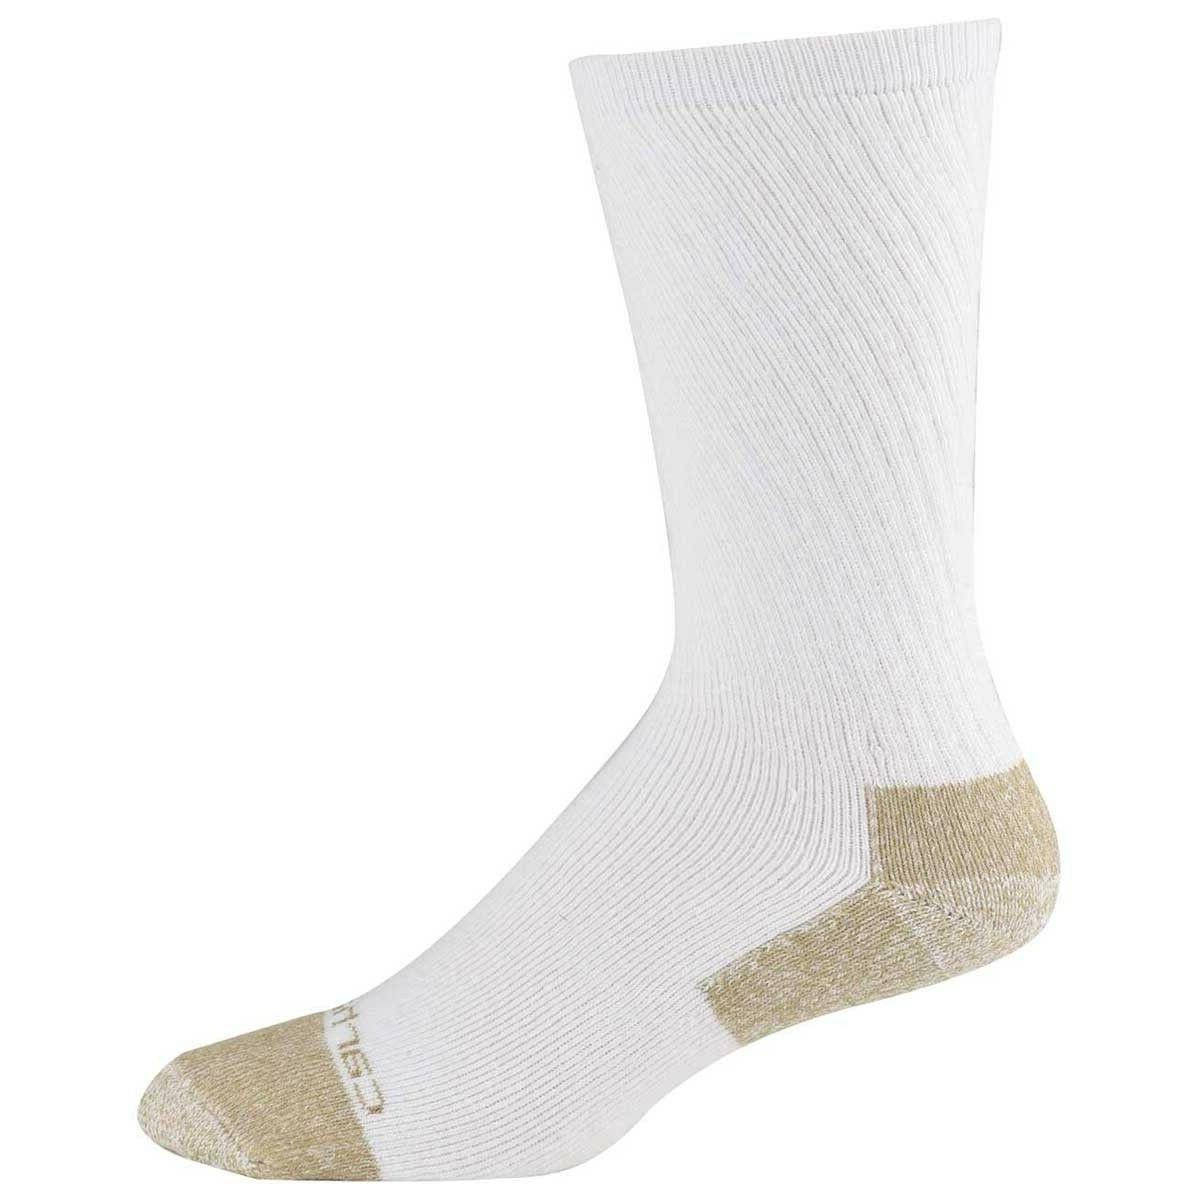 Carhartt A555 Men's Cotton Steel Toe Crew Sock 2 Pack